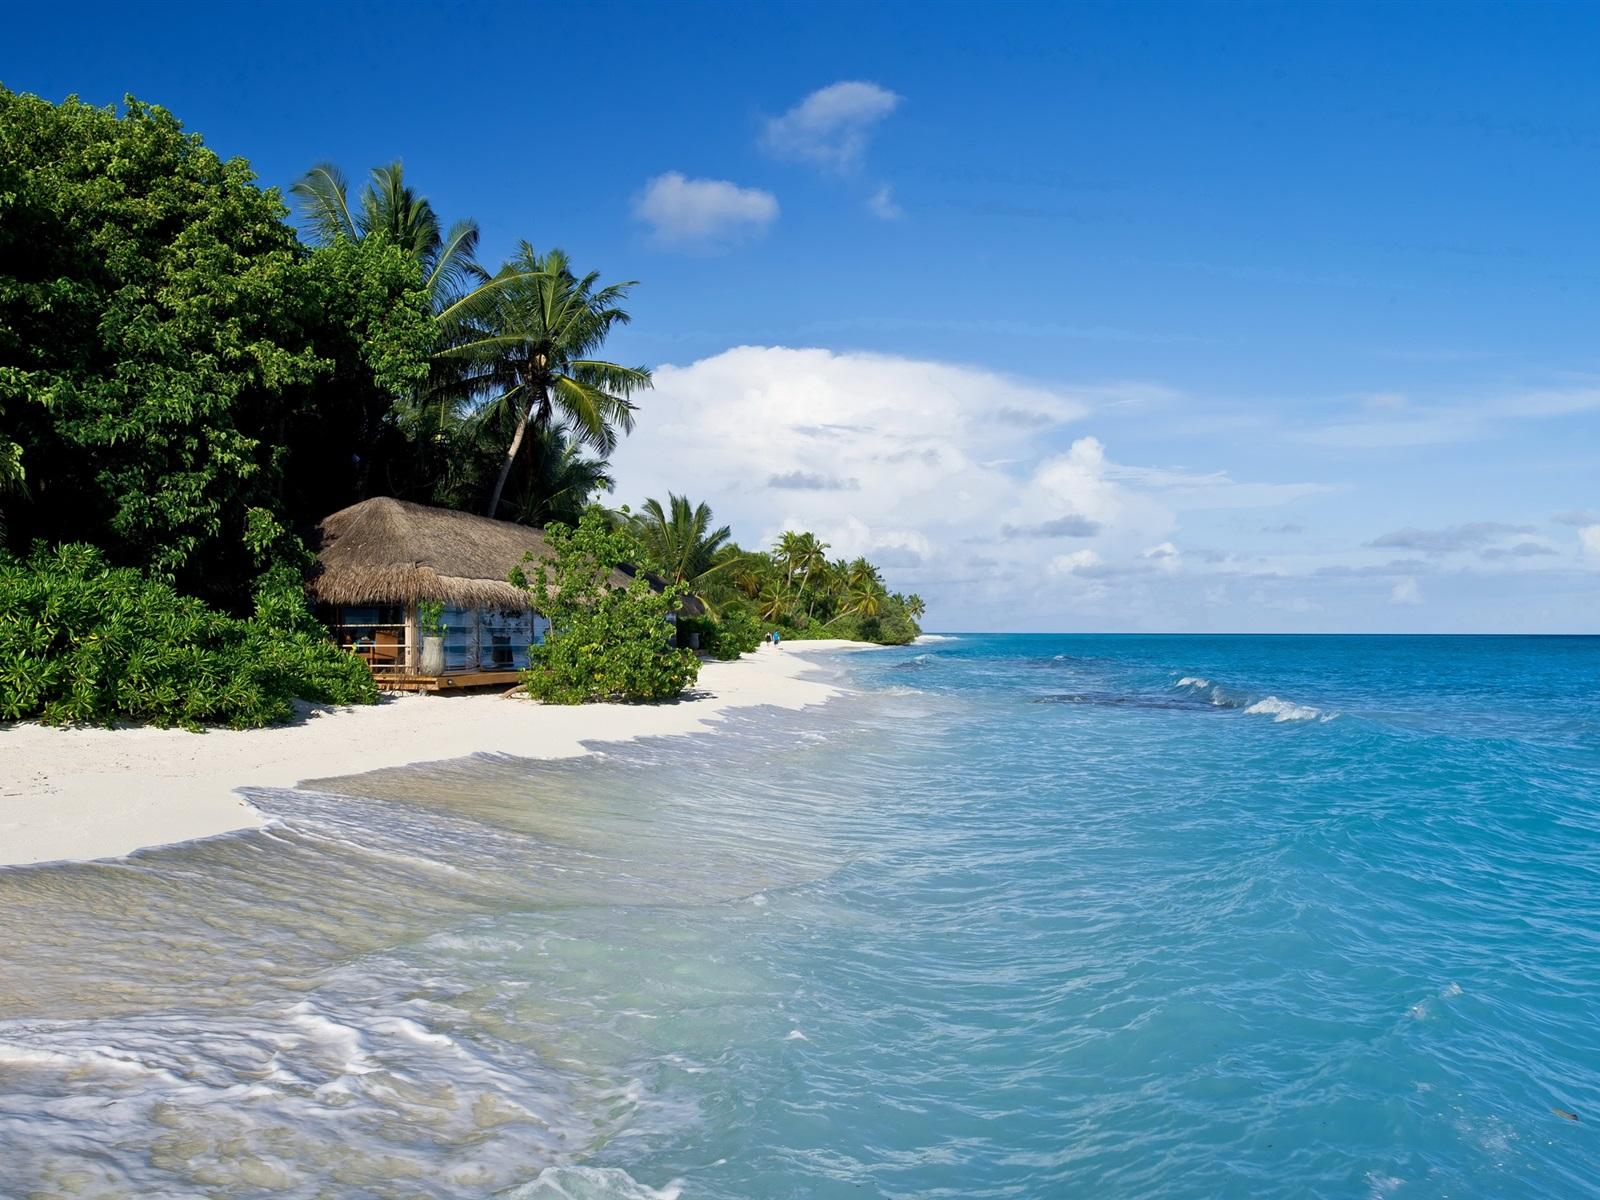 malediven tropisch meer strand -#main